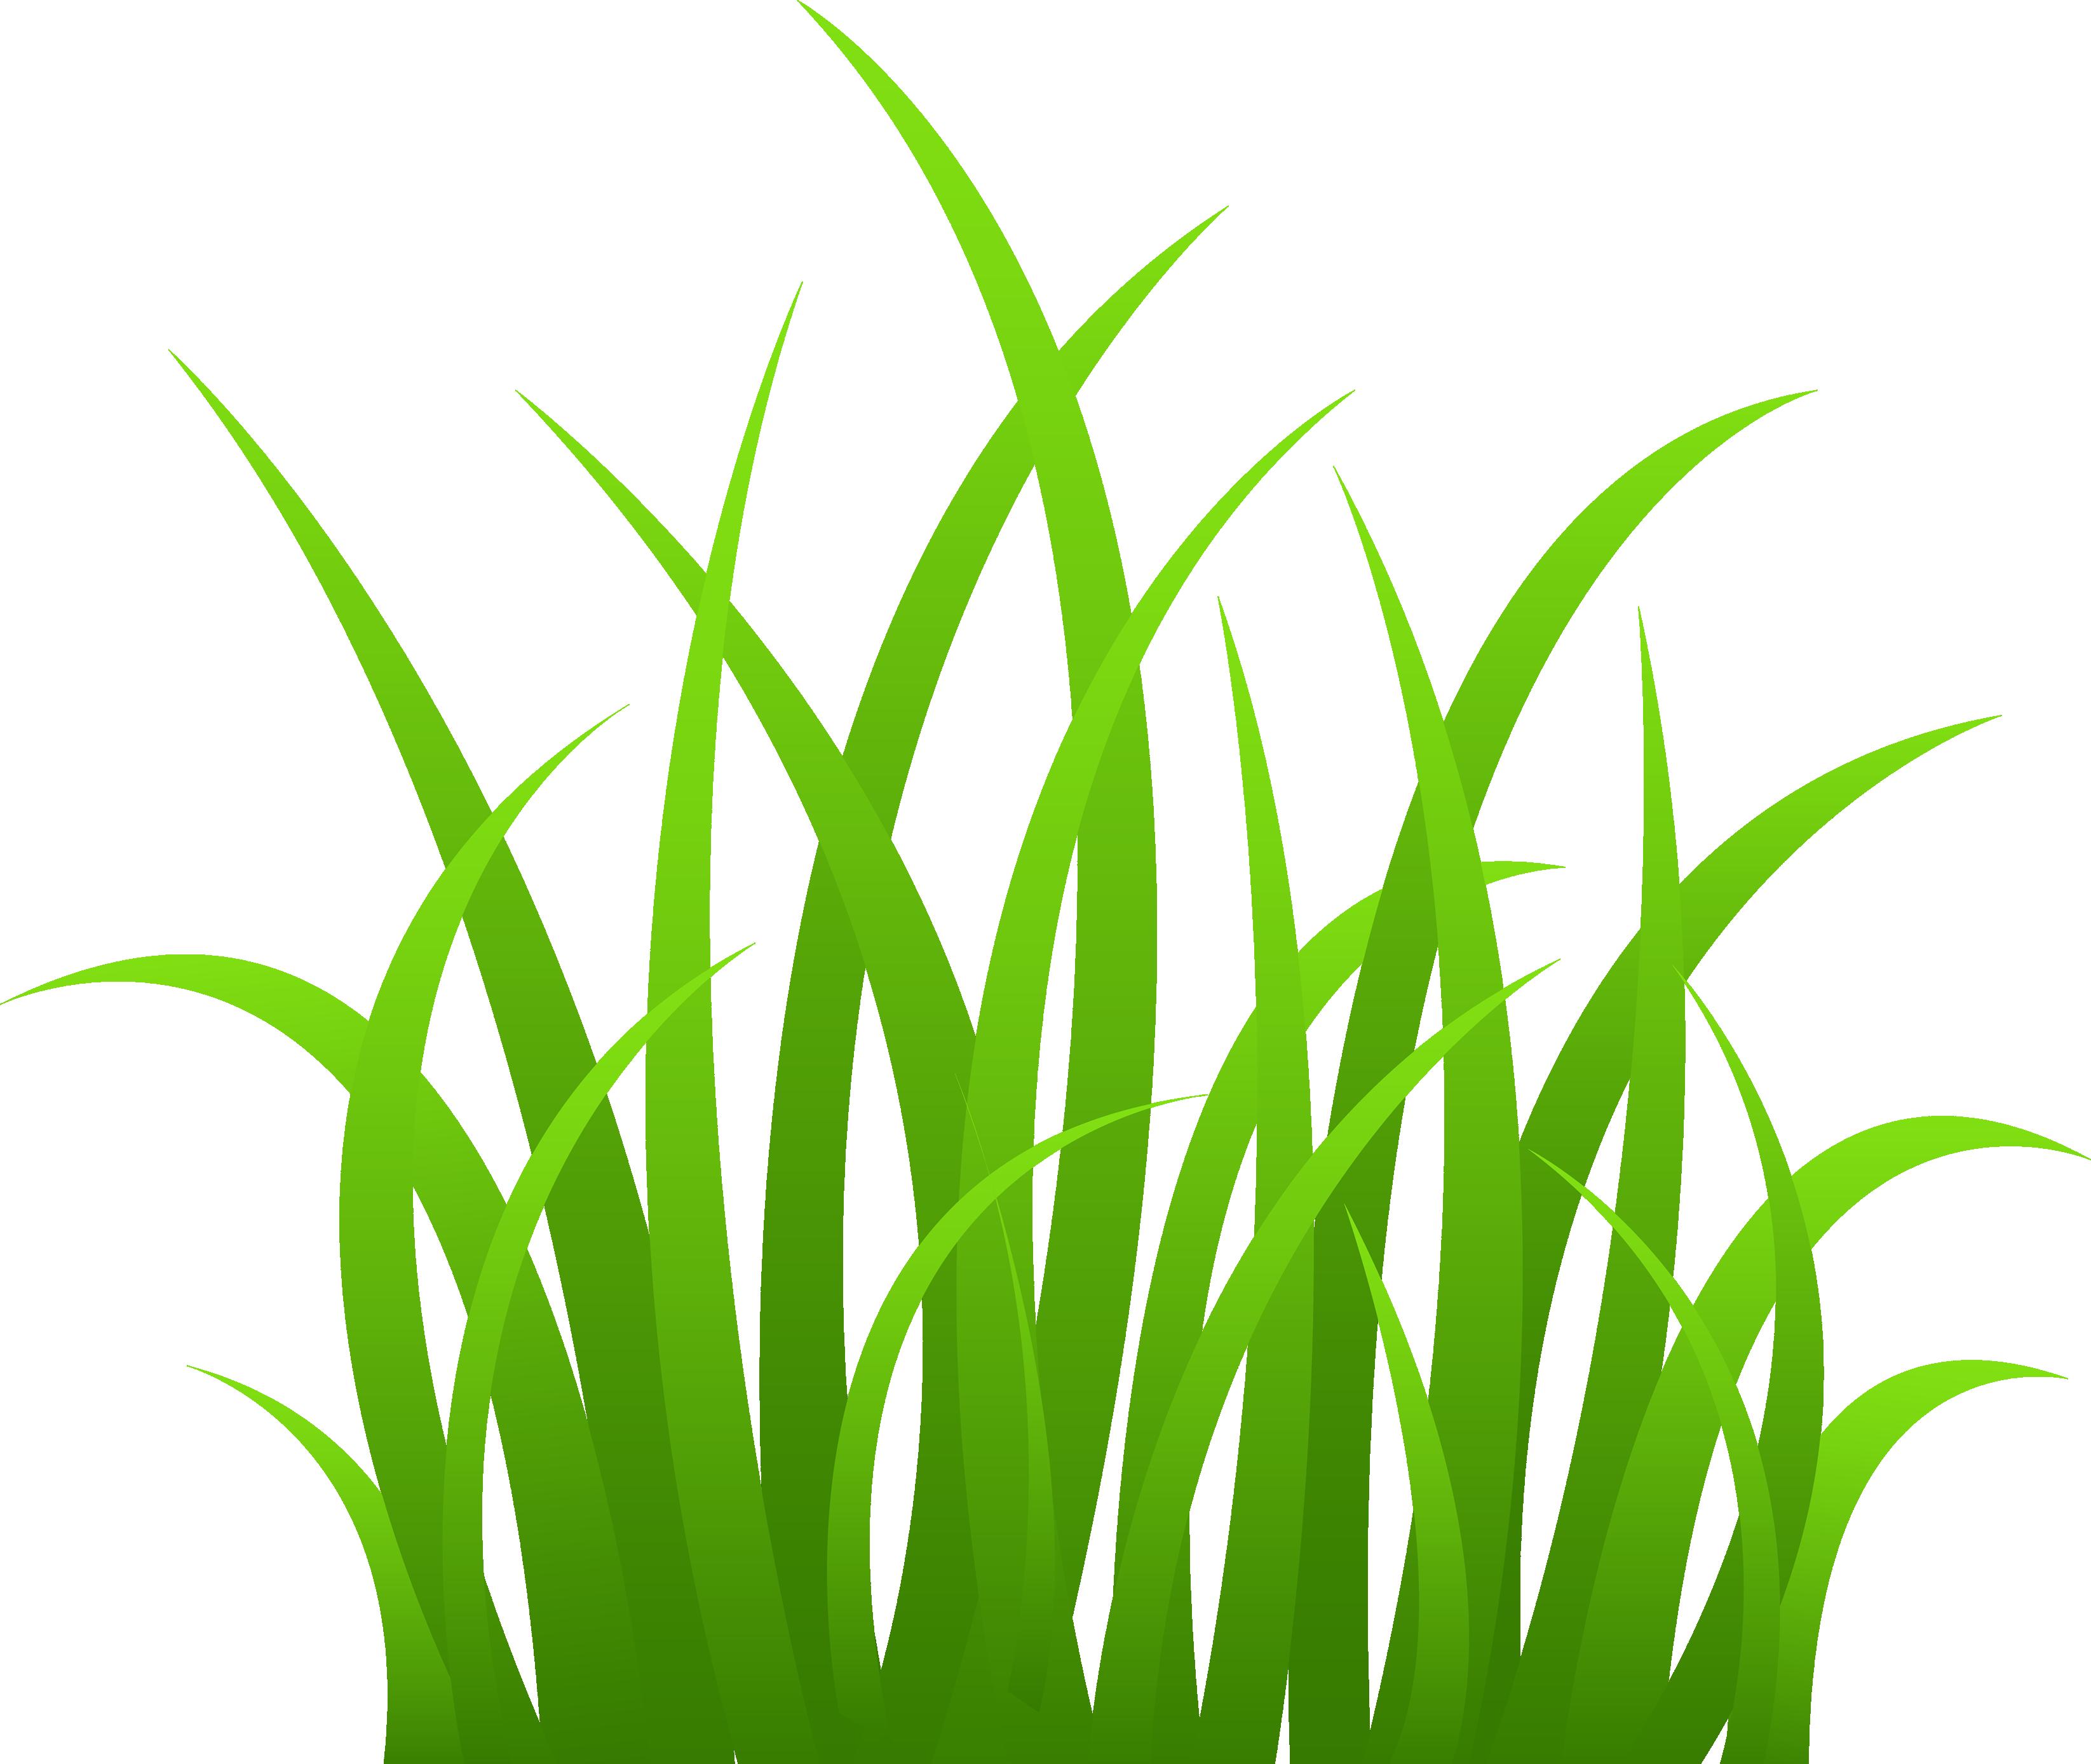 Planting clipart safari. Get a greener safer